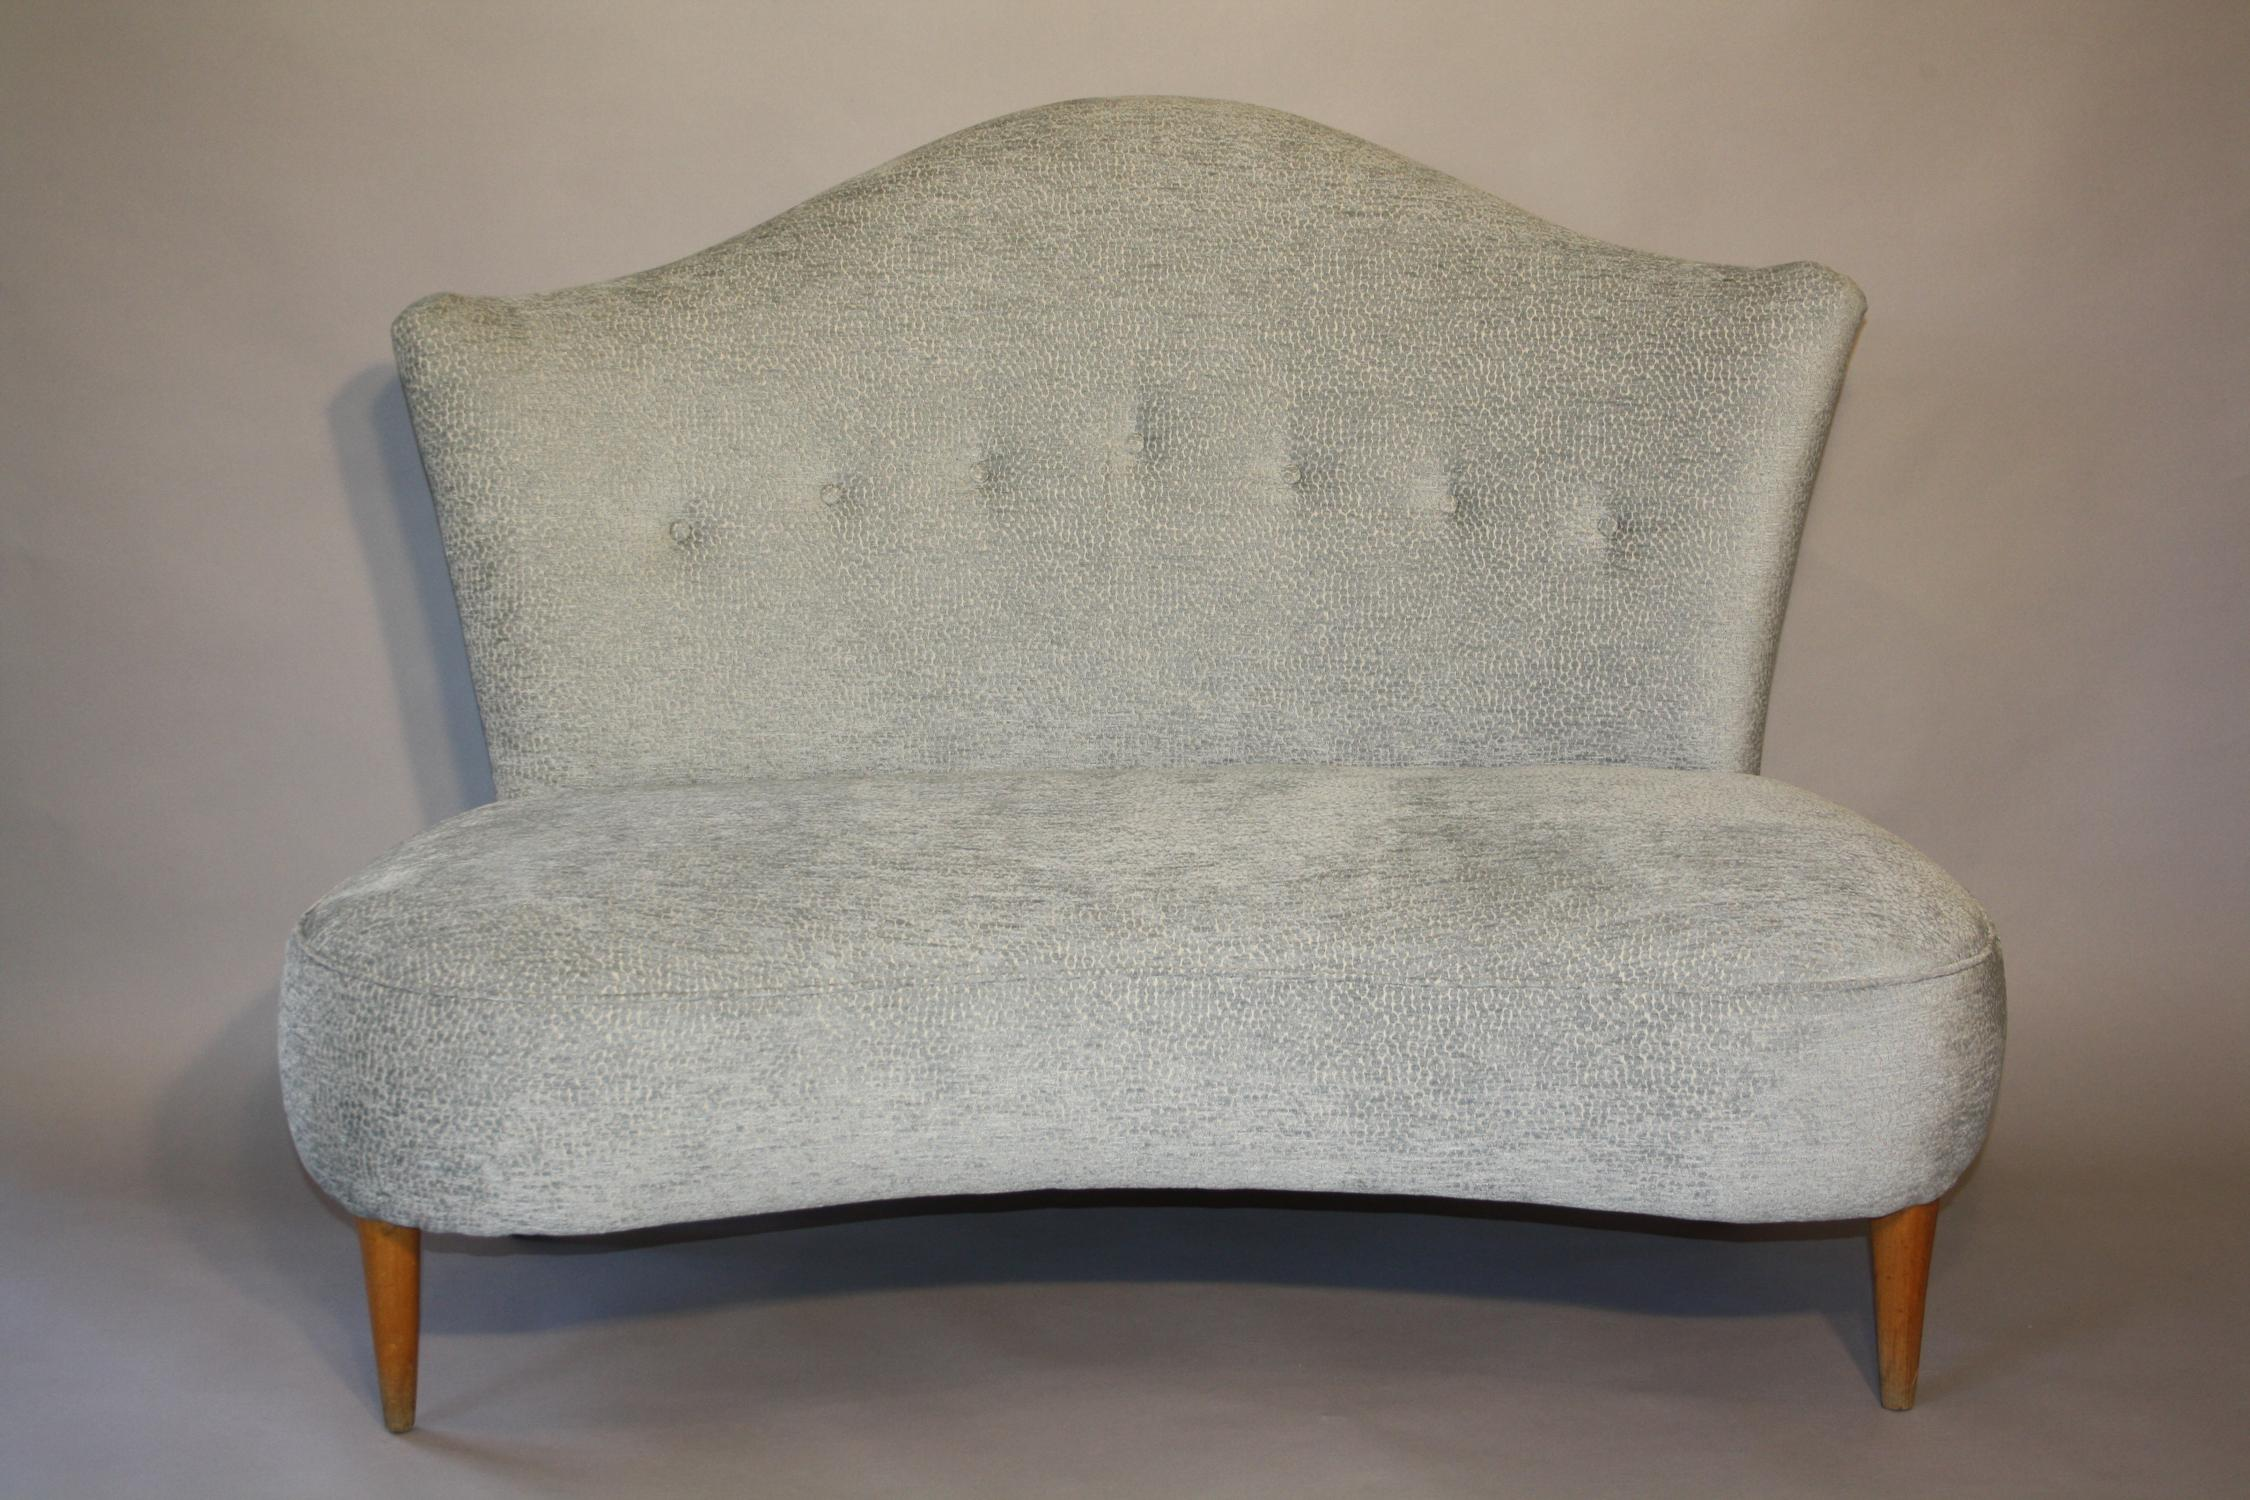 Small Italian sofa